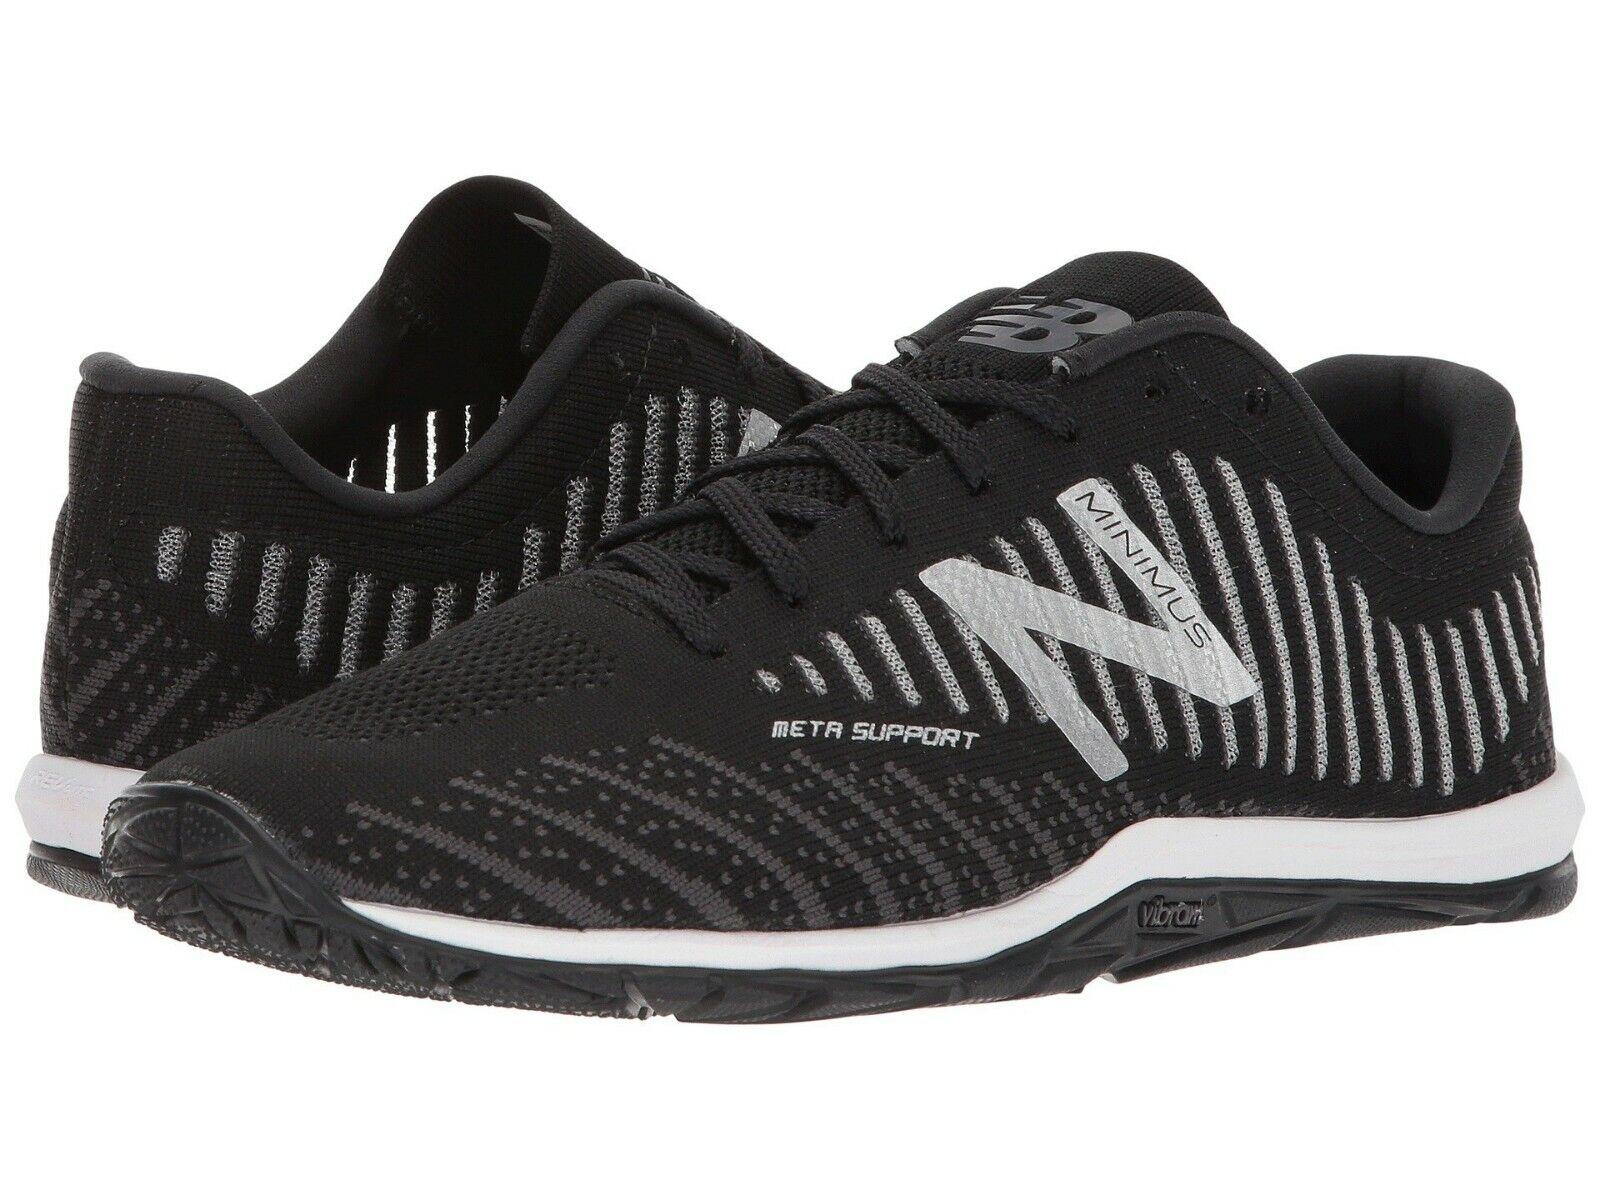 NEW Mens New Balance Minimus 20v7 Black White Magnet Cross Training shoes IN BOX